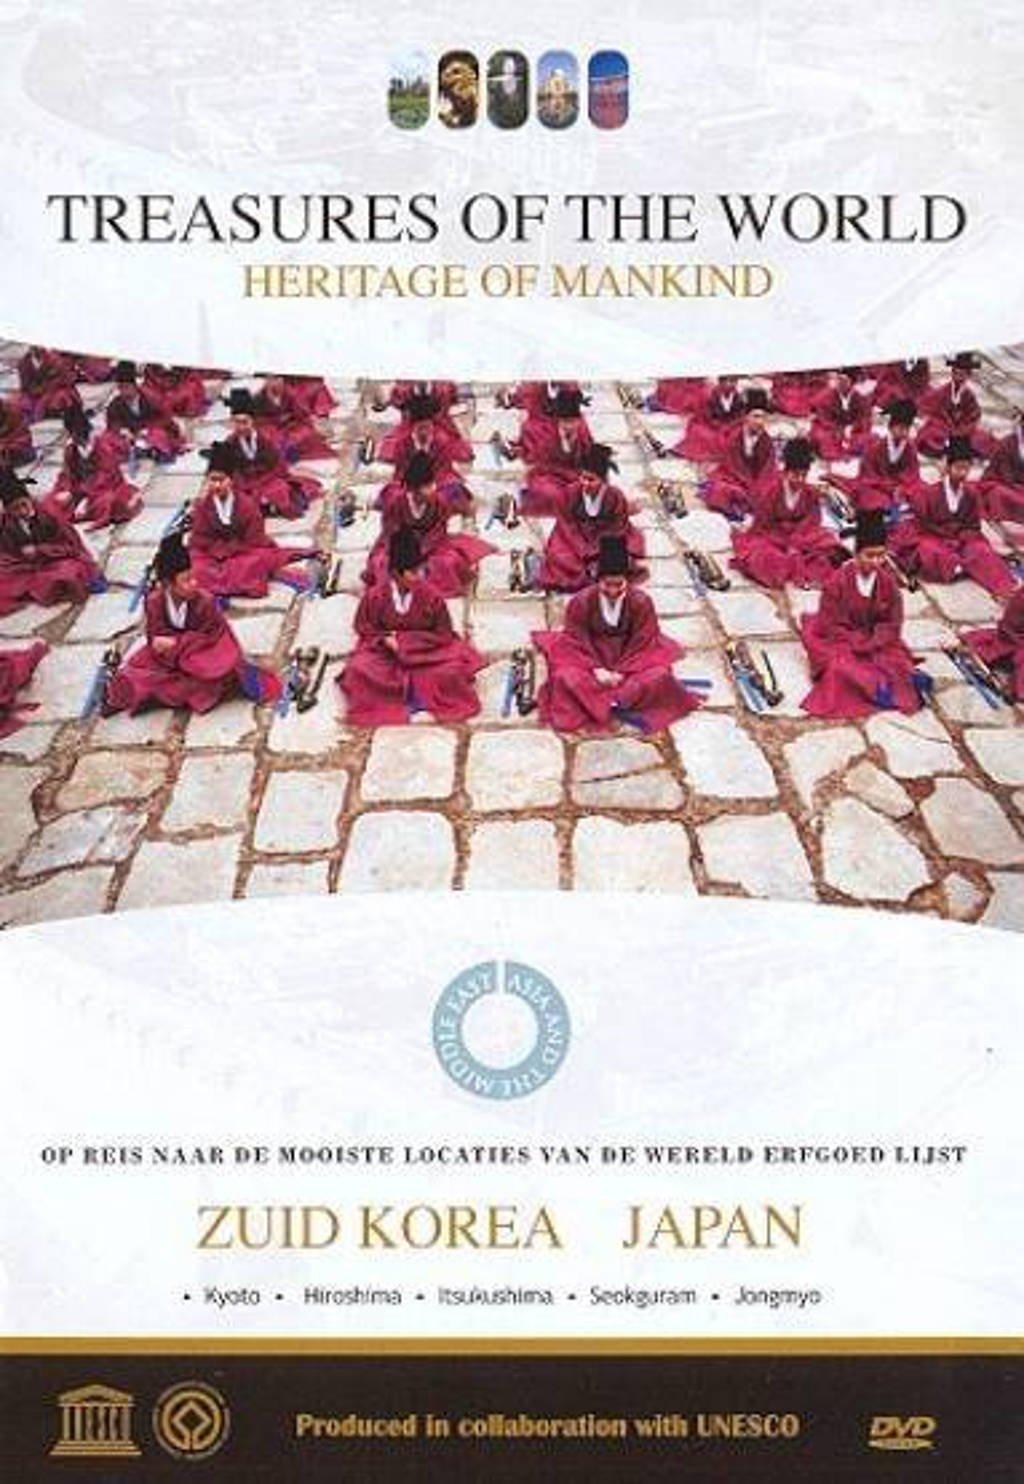 Treasures of the world 5 - Zuid Korea (DVD)